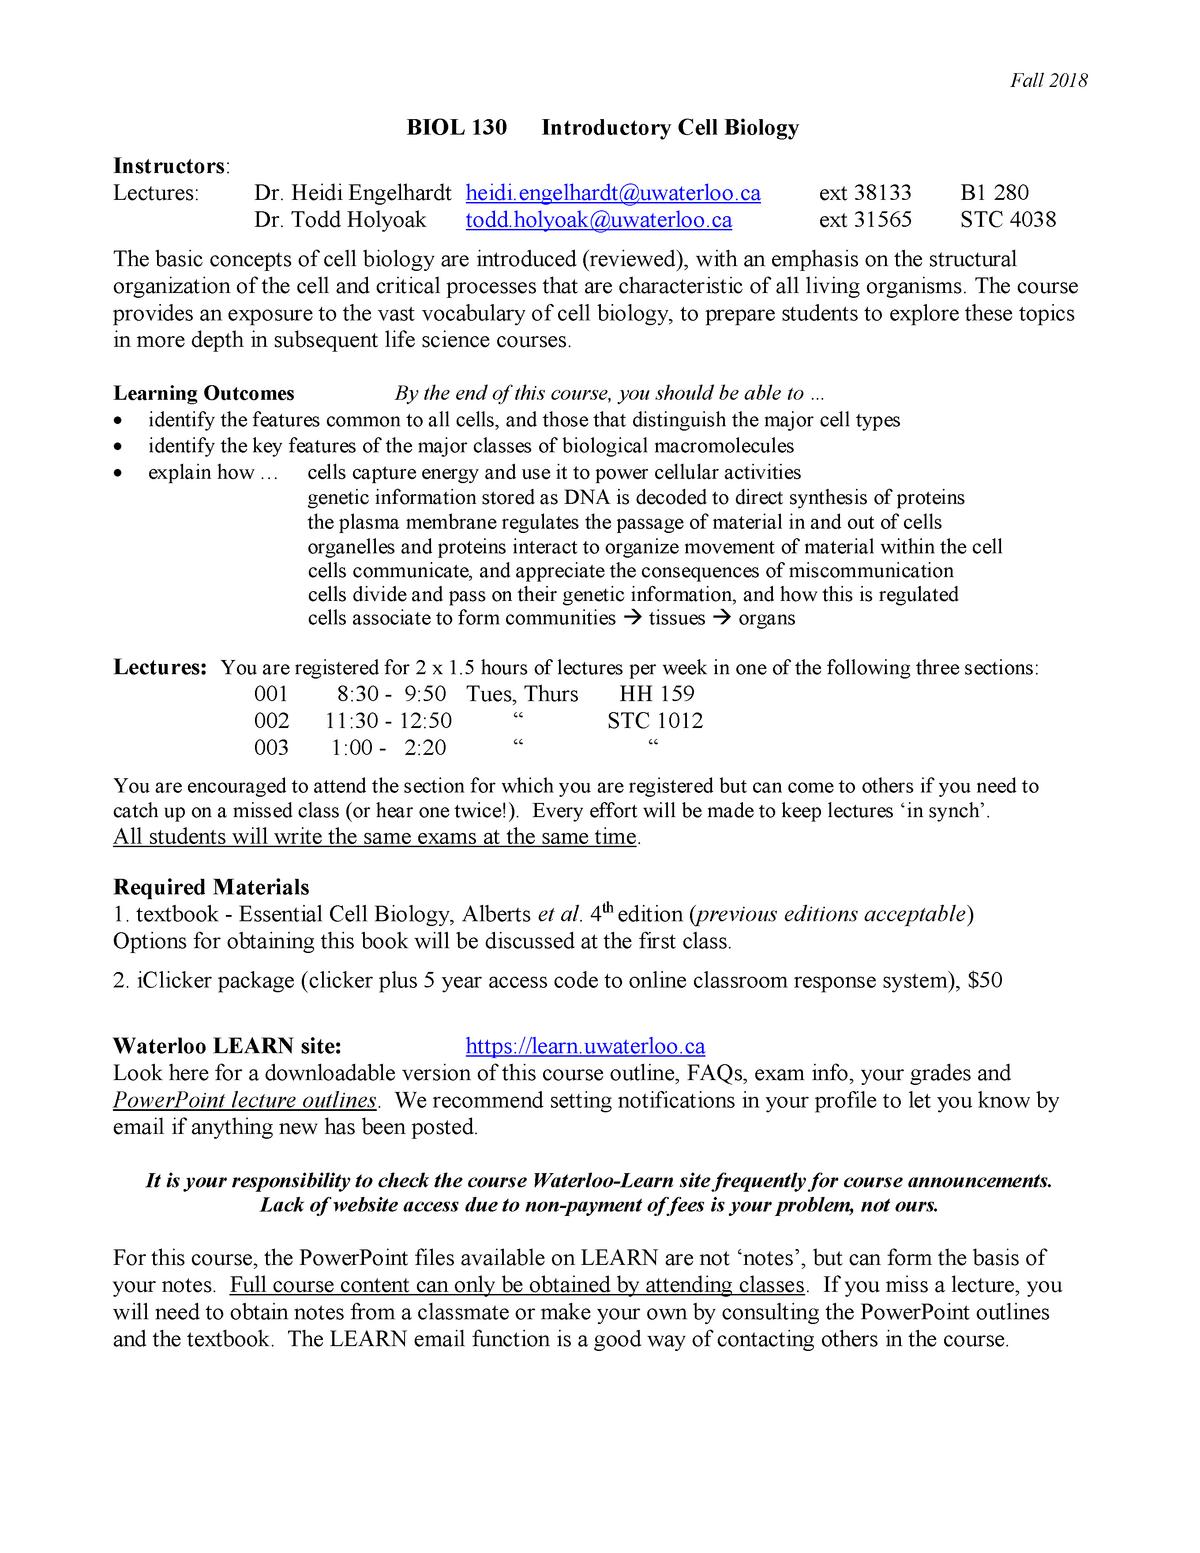 Biol 130 fall 2018 - course outline - Bio 130: Biology - StuDocu